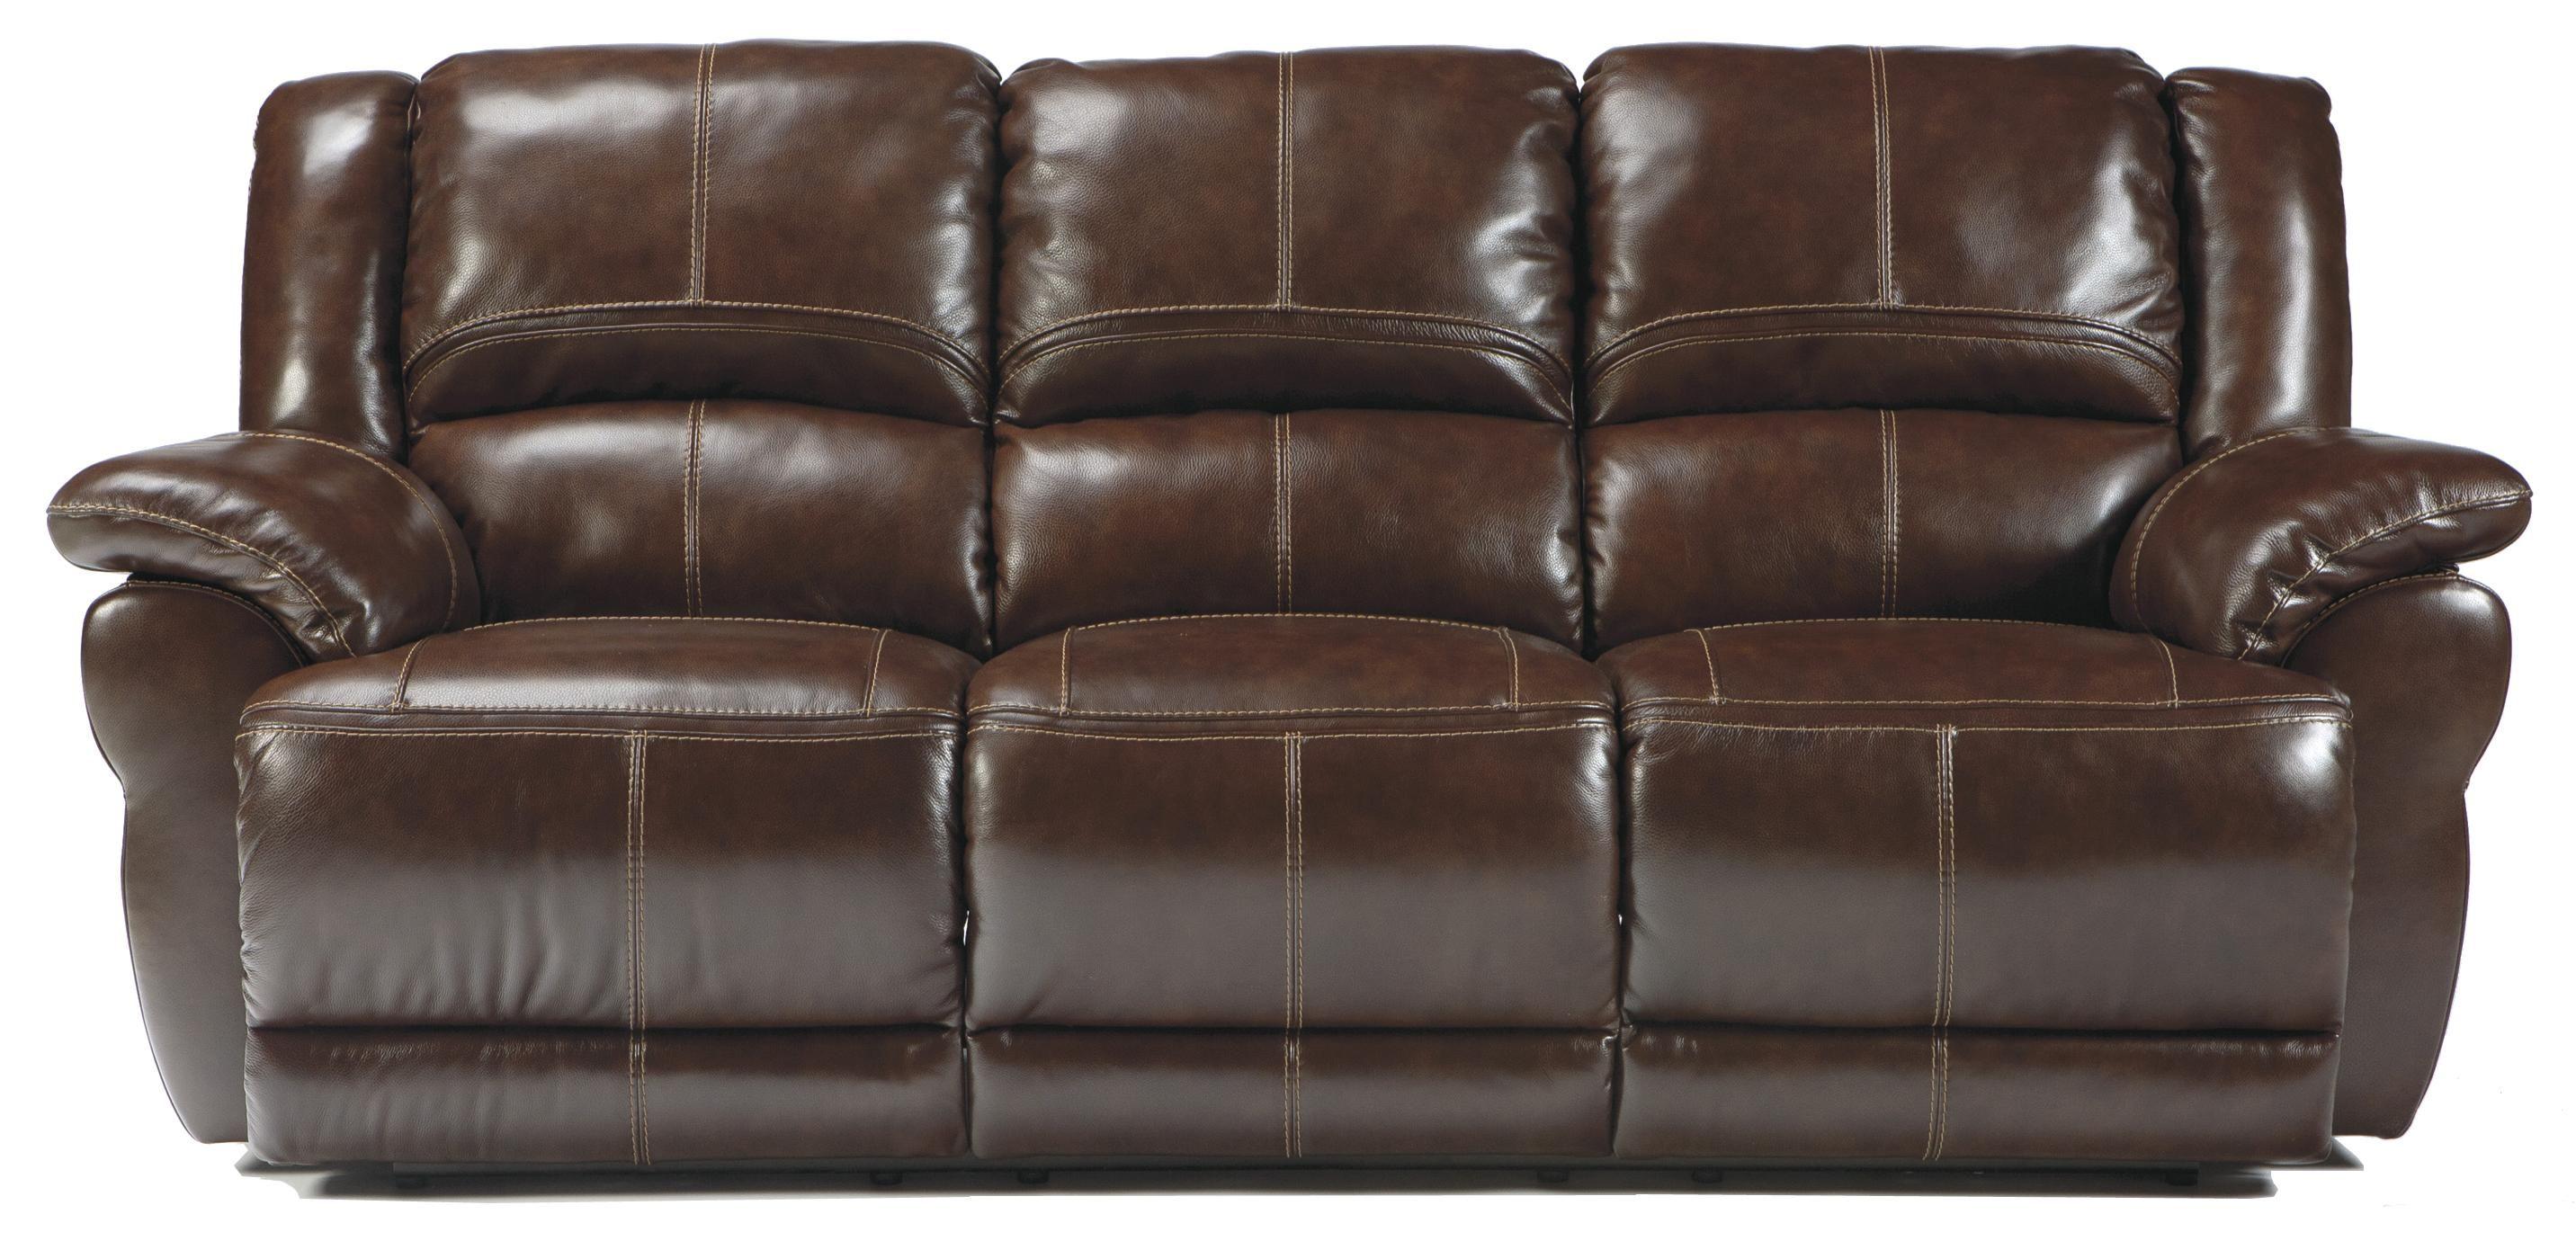 Lenoris Coffee Reclining Power Sofa By Signature Design By Ashley Power Reclining Sofa Leather Reclining Sofa Reclining Sofa